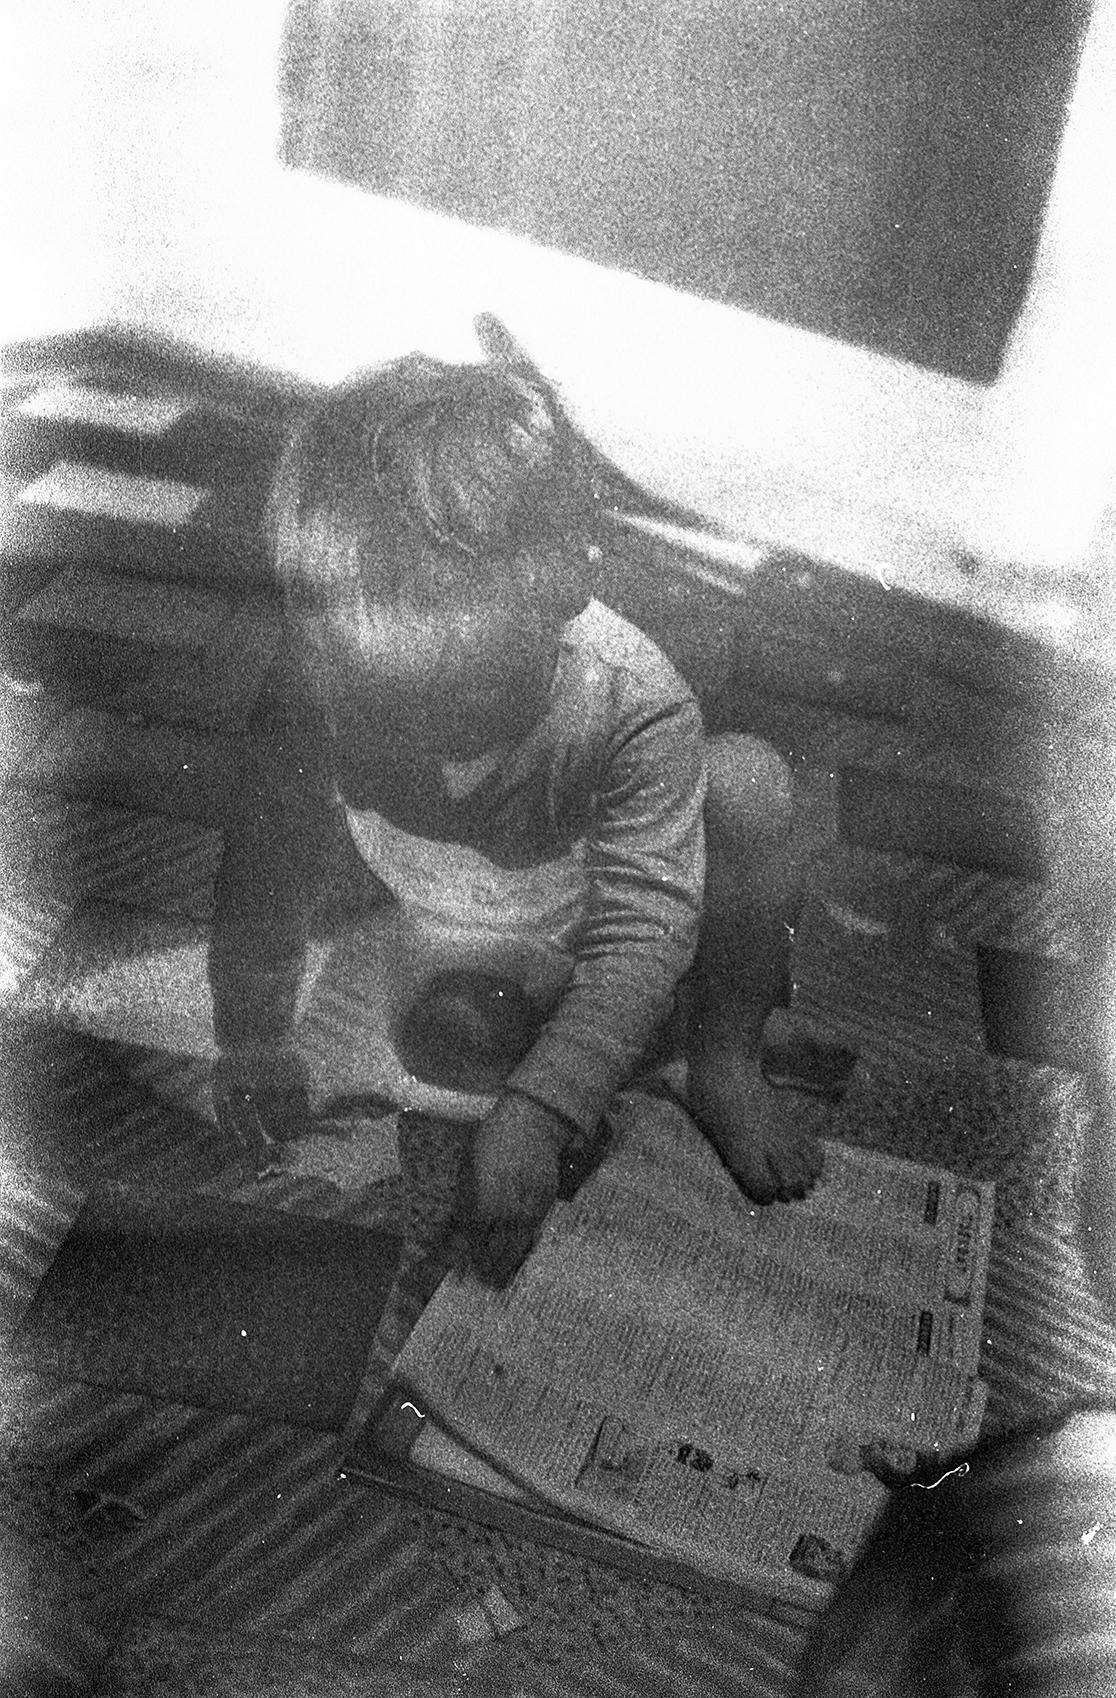 Paul Bundle 20 Roll 11 007.jpg